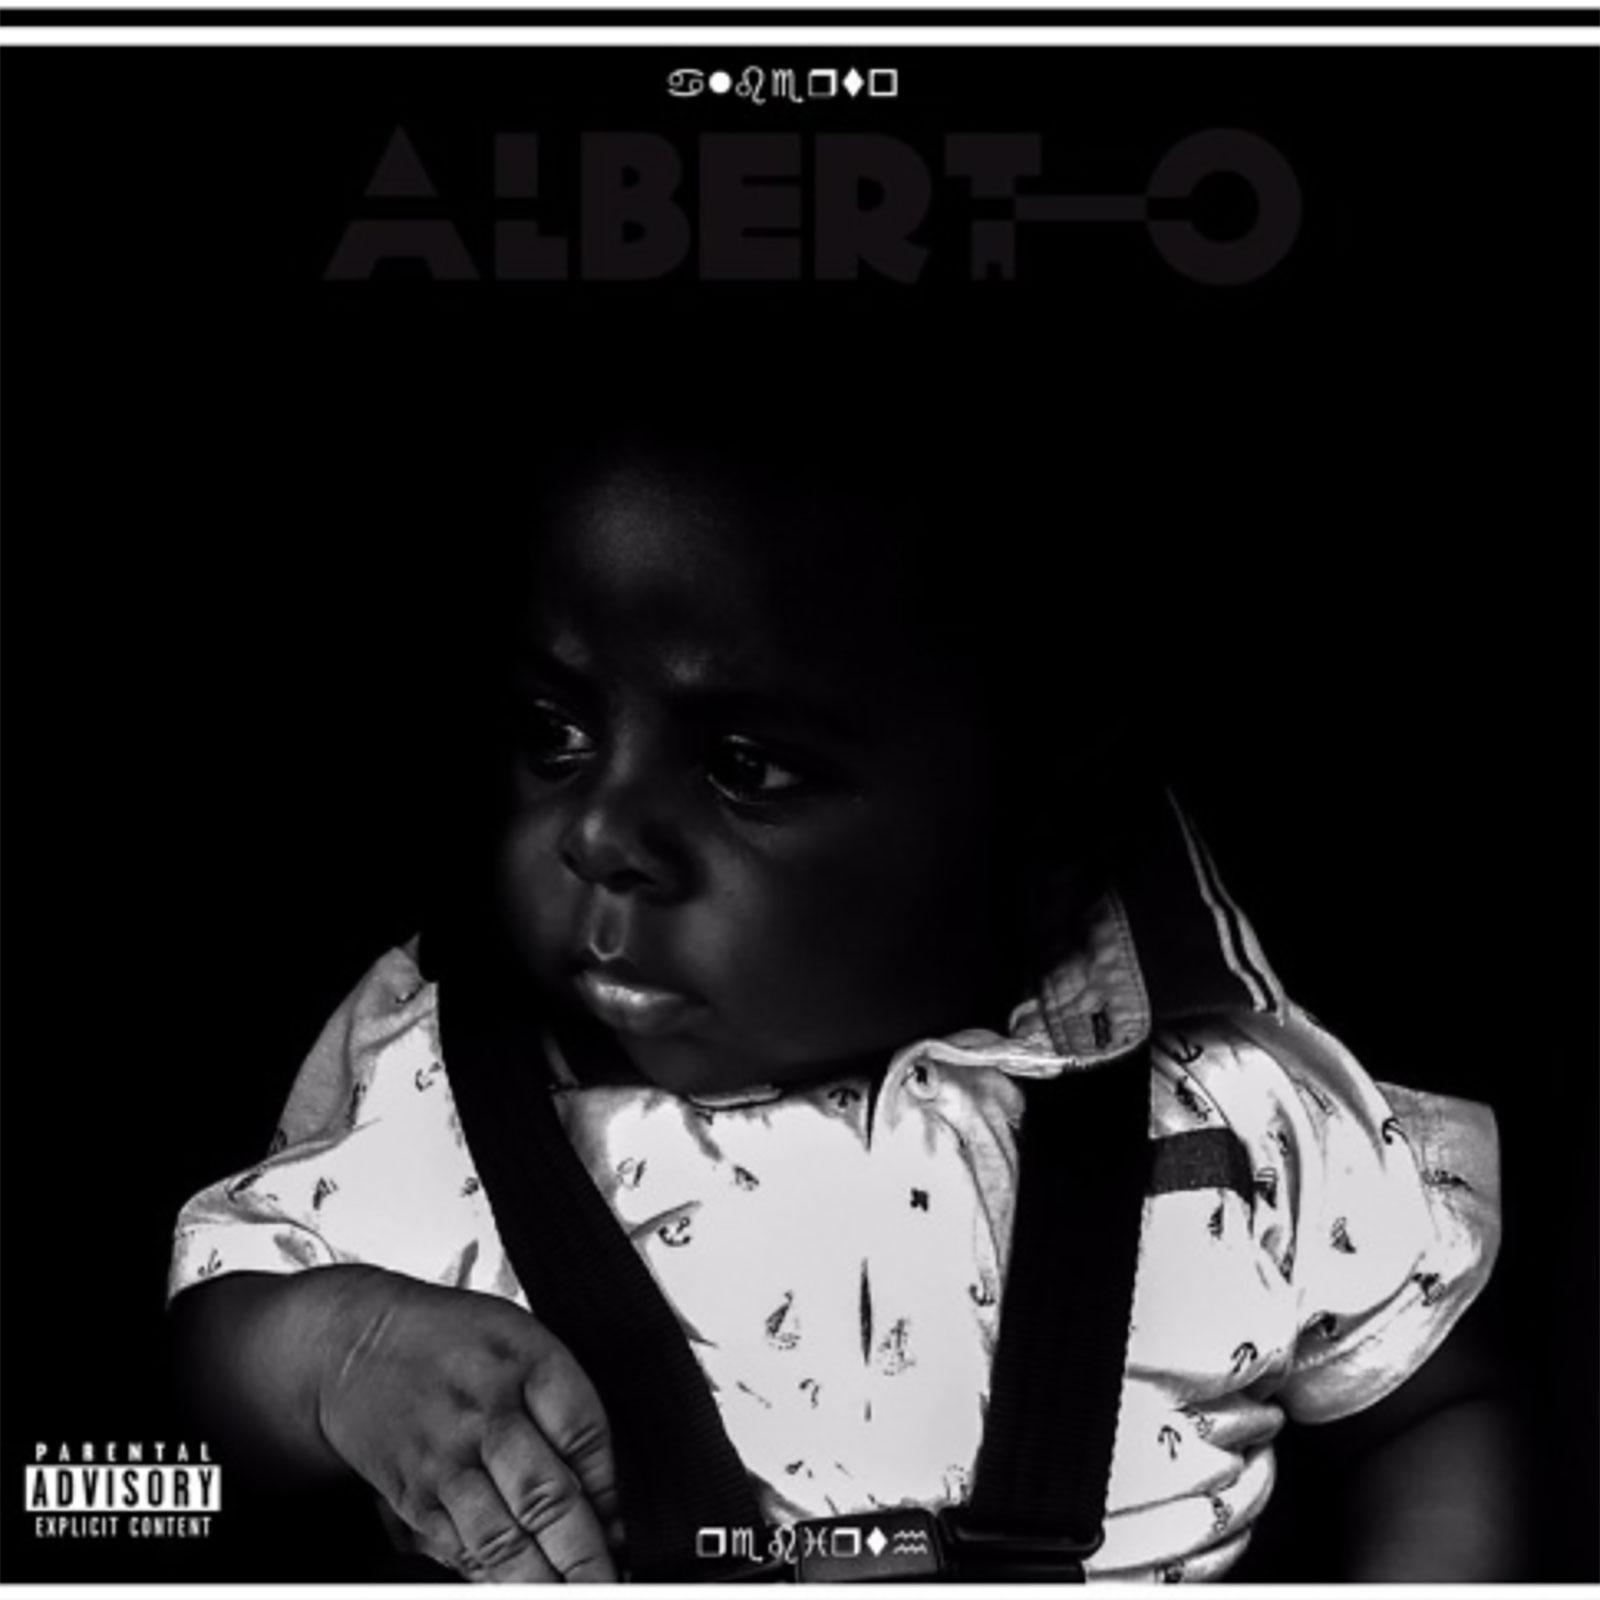 I Got You by Albert-O feat. Piesie & Donzy